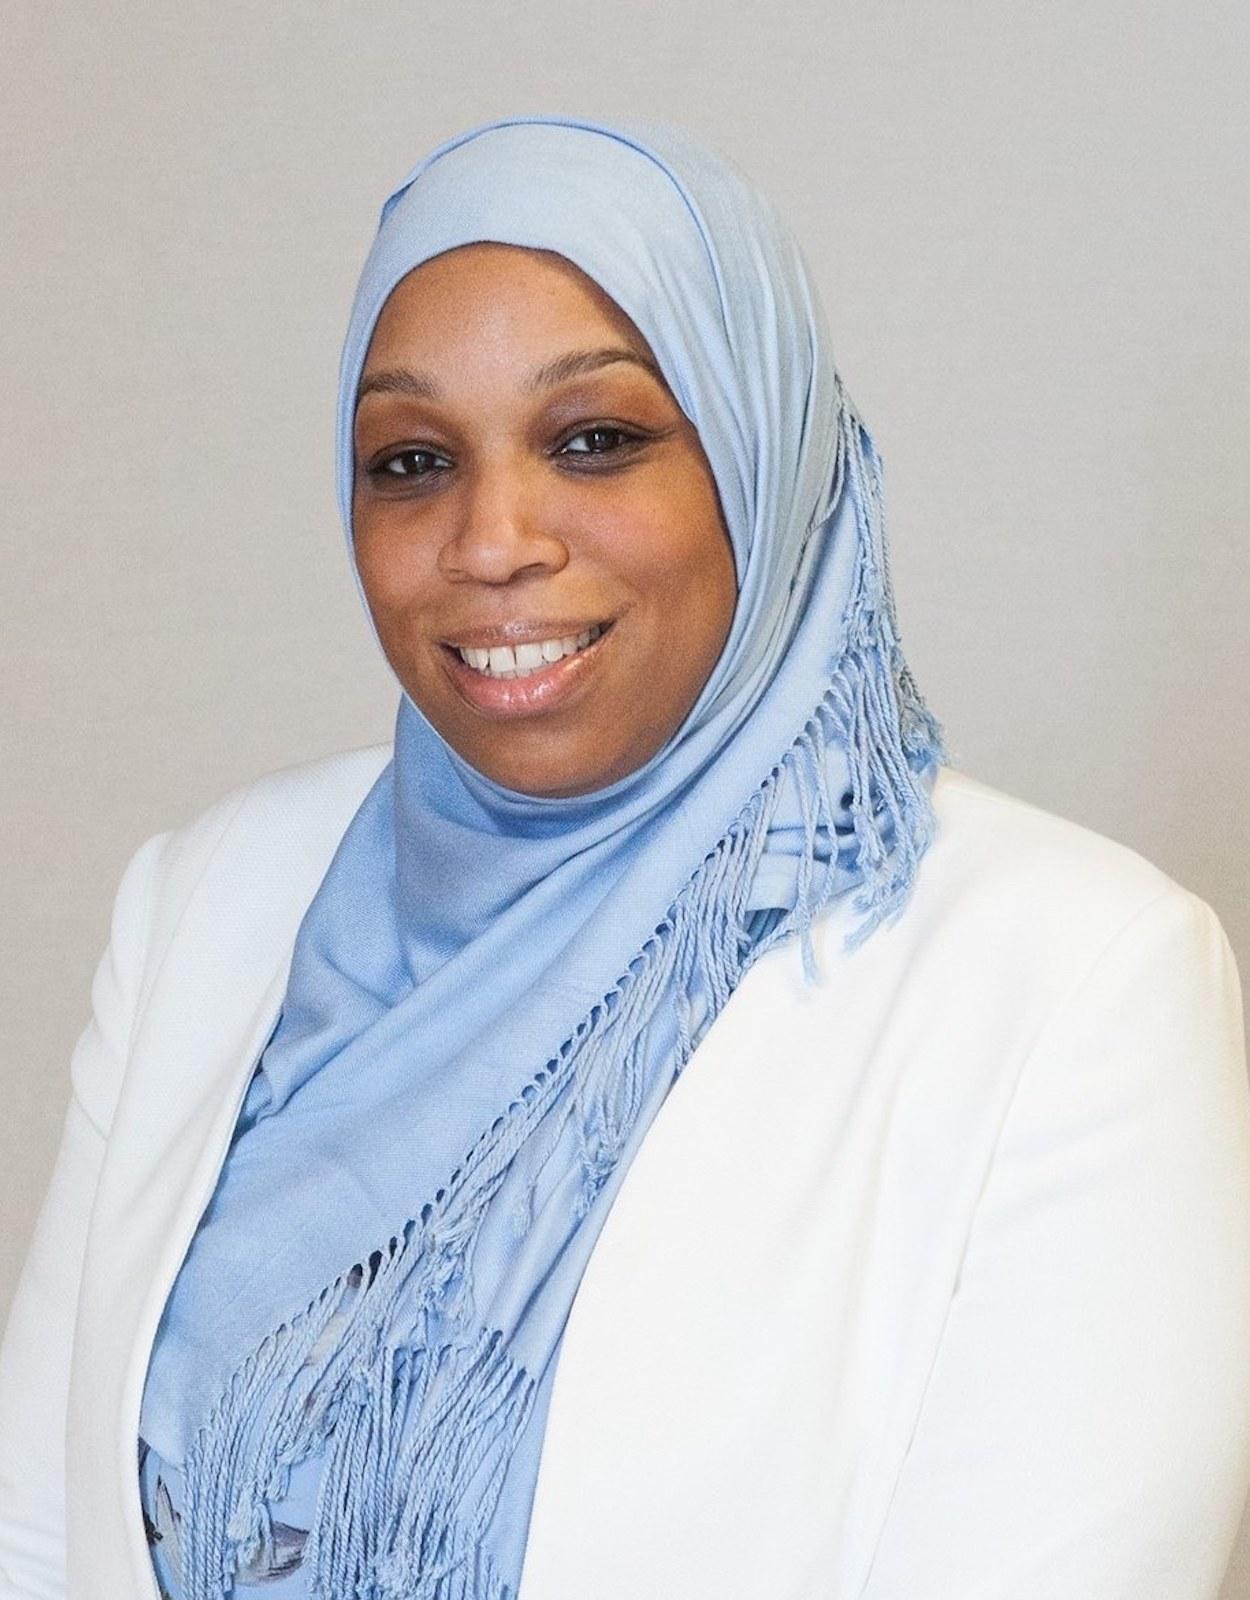 Tahirah Amatul Wadud, Willoughby Avenue, The Five Fifths, KOLUMN Magazine, KOLUMN, African American Politics, Black in Politics